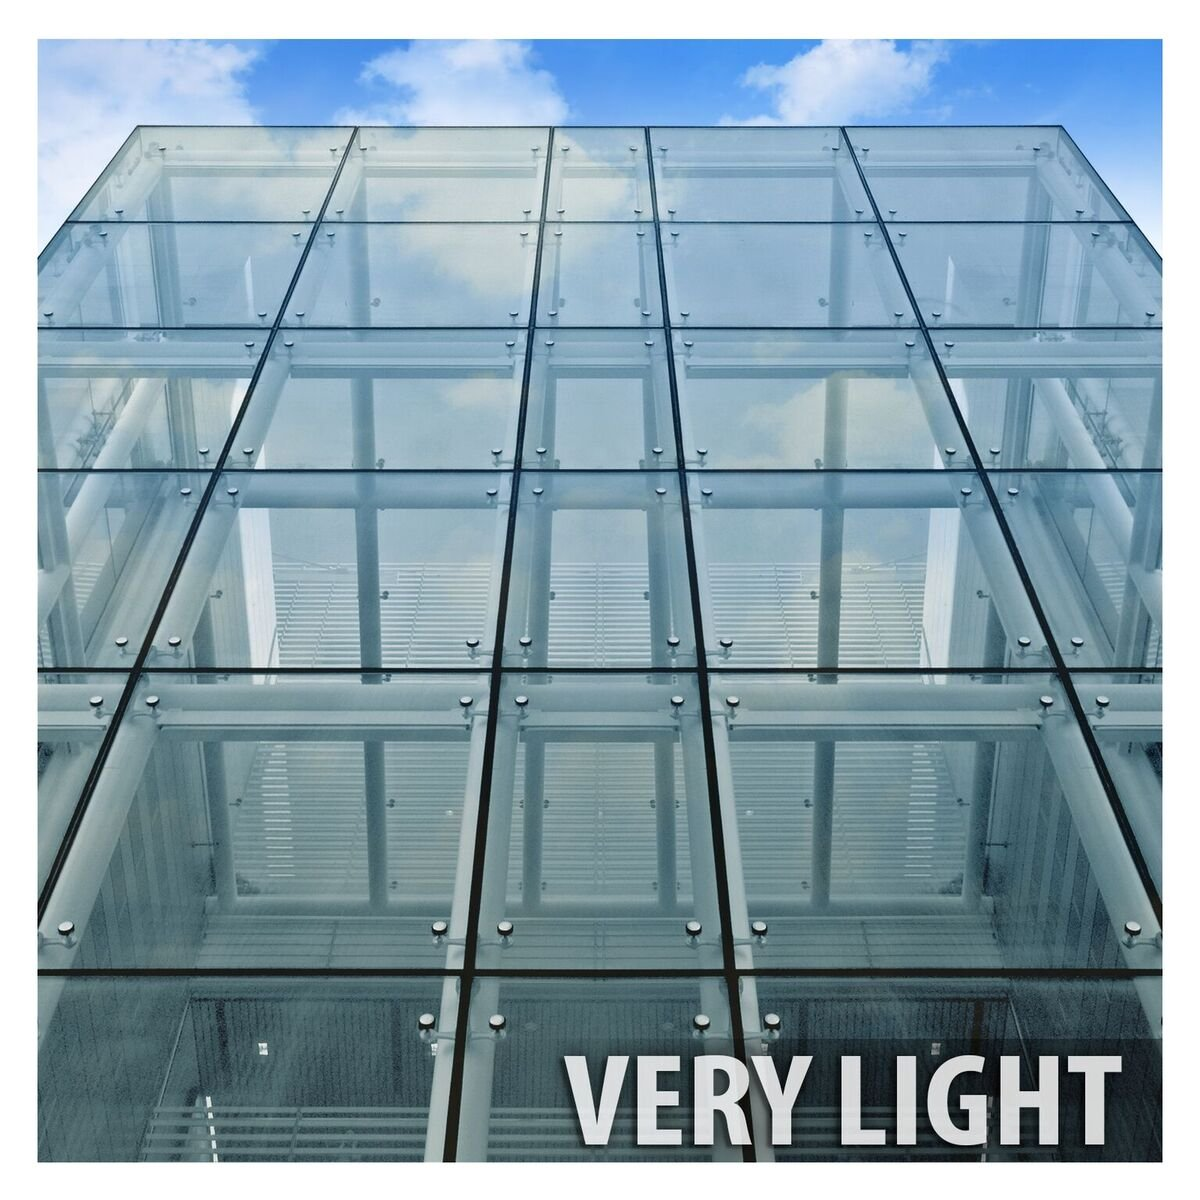 BDF HNC70 Window Film Premium Heat Control and Energy Saving, Chrome (Very Light) - 48in X 15ft